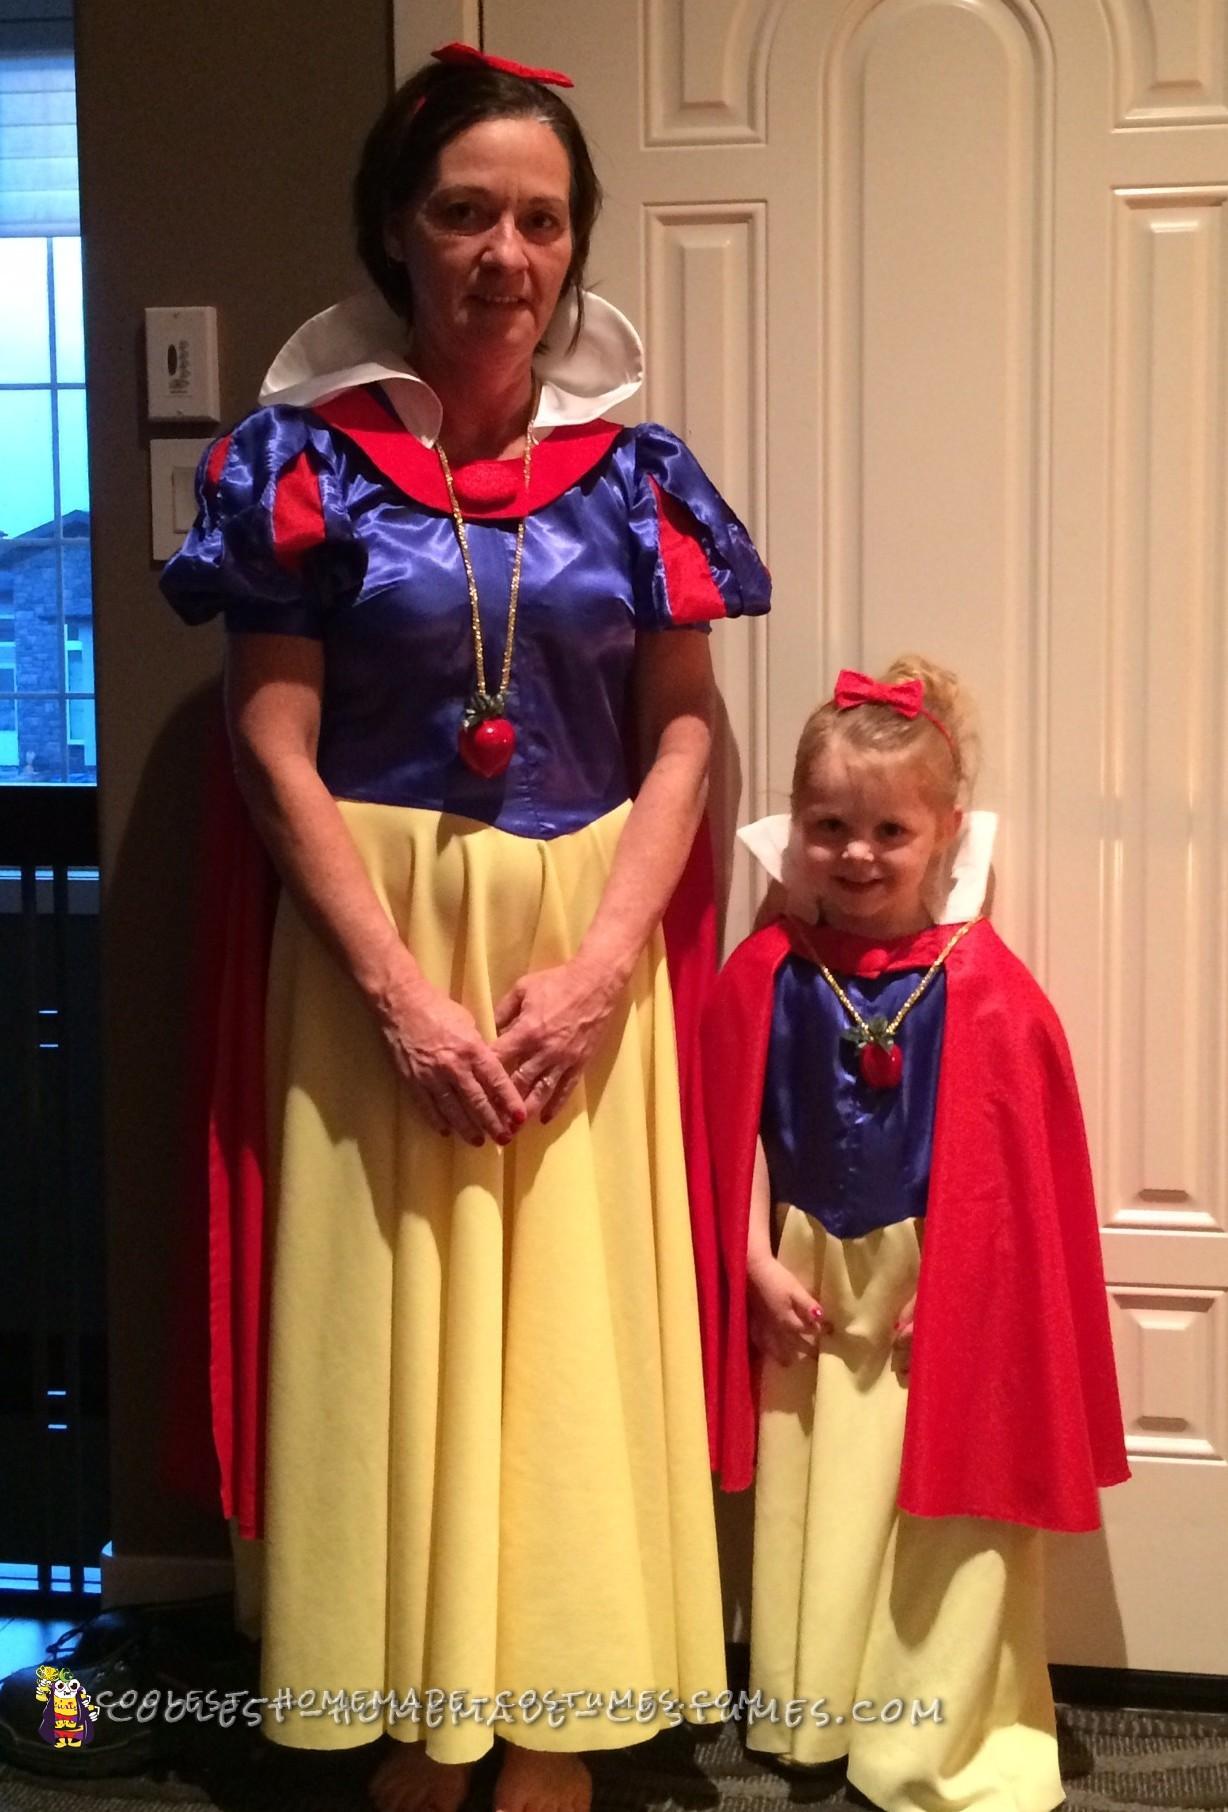 Grandma and Granddaughter Snow White Costumes